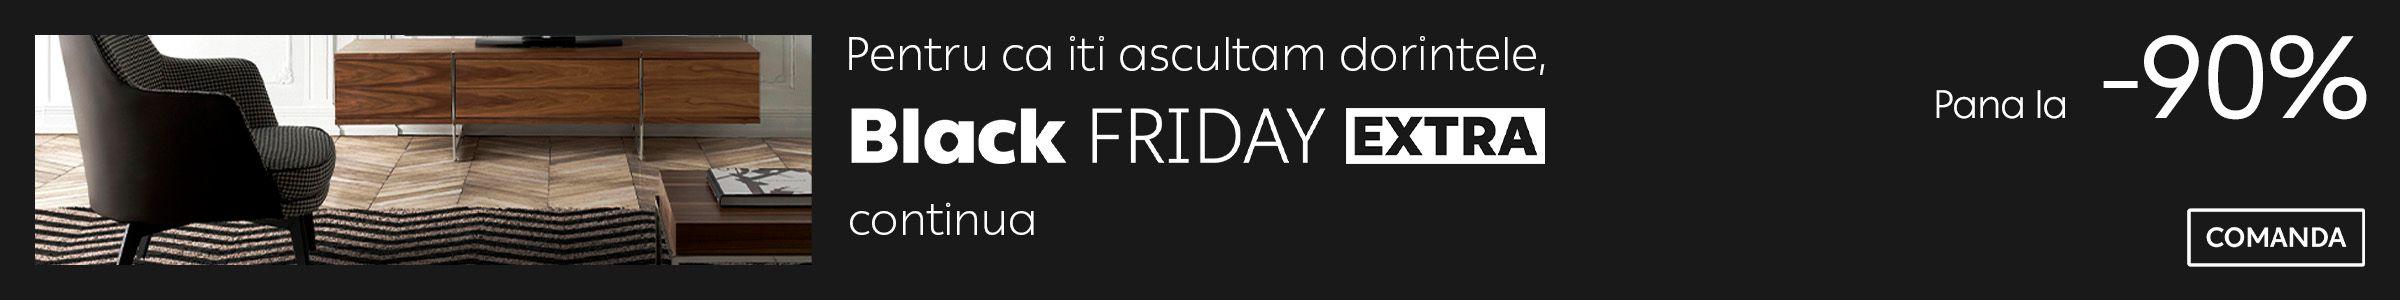 Black Friday Extra